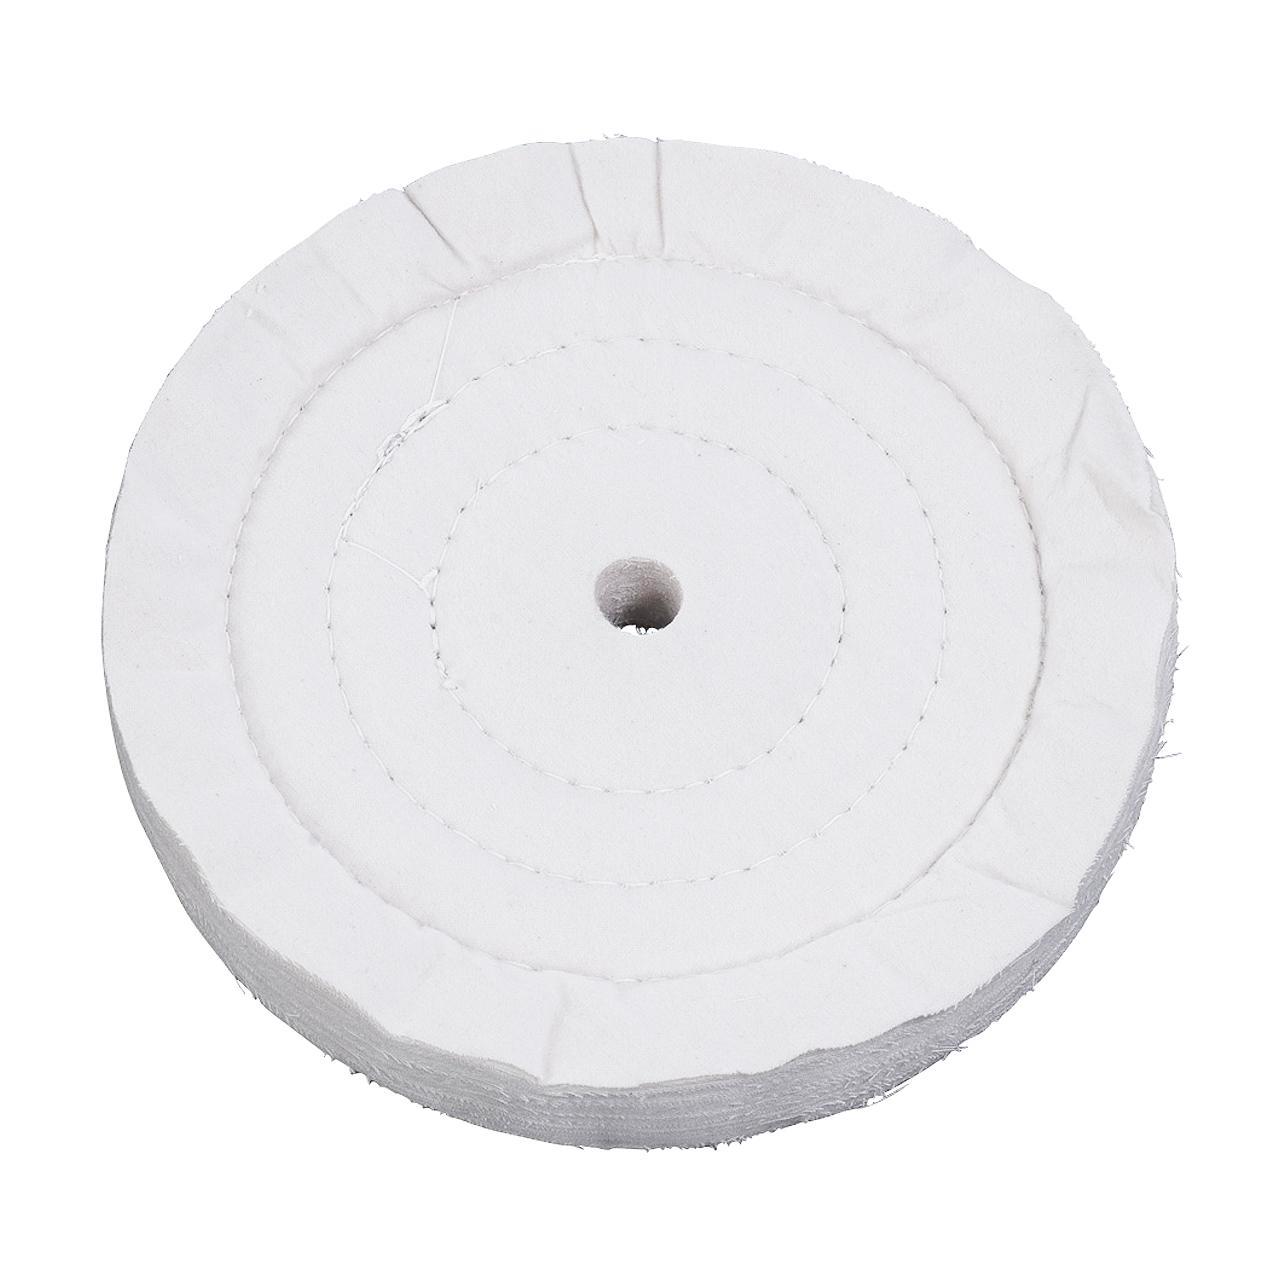 Tarcza polerska z moltonu pikowana Ø 250 x 25 mm, Ø 20 mm BERNARDO